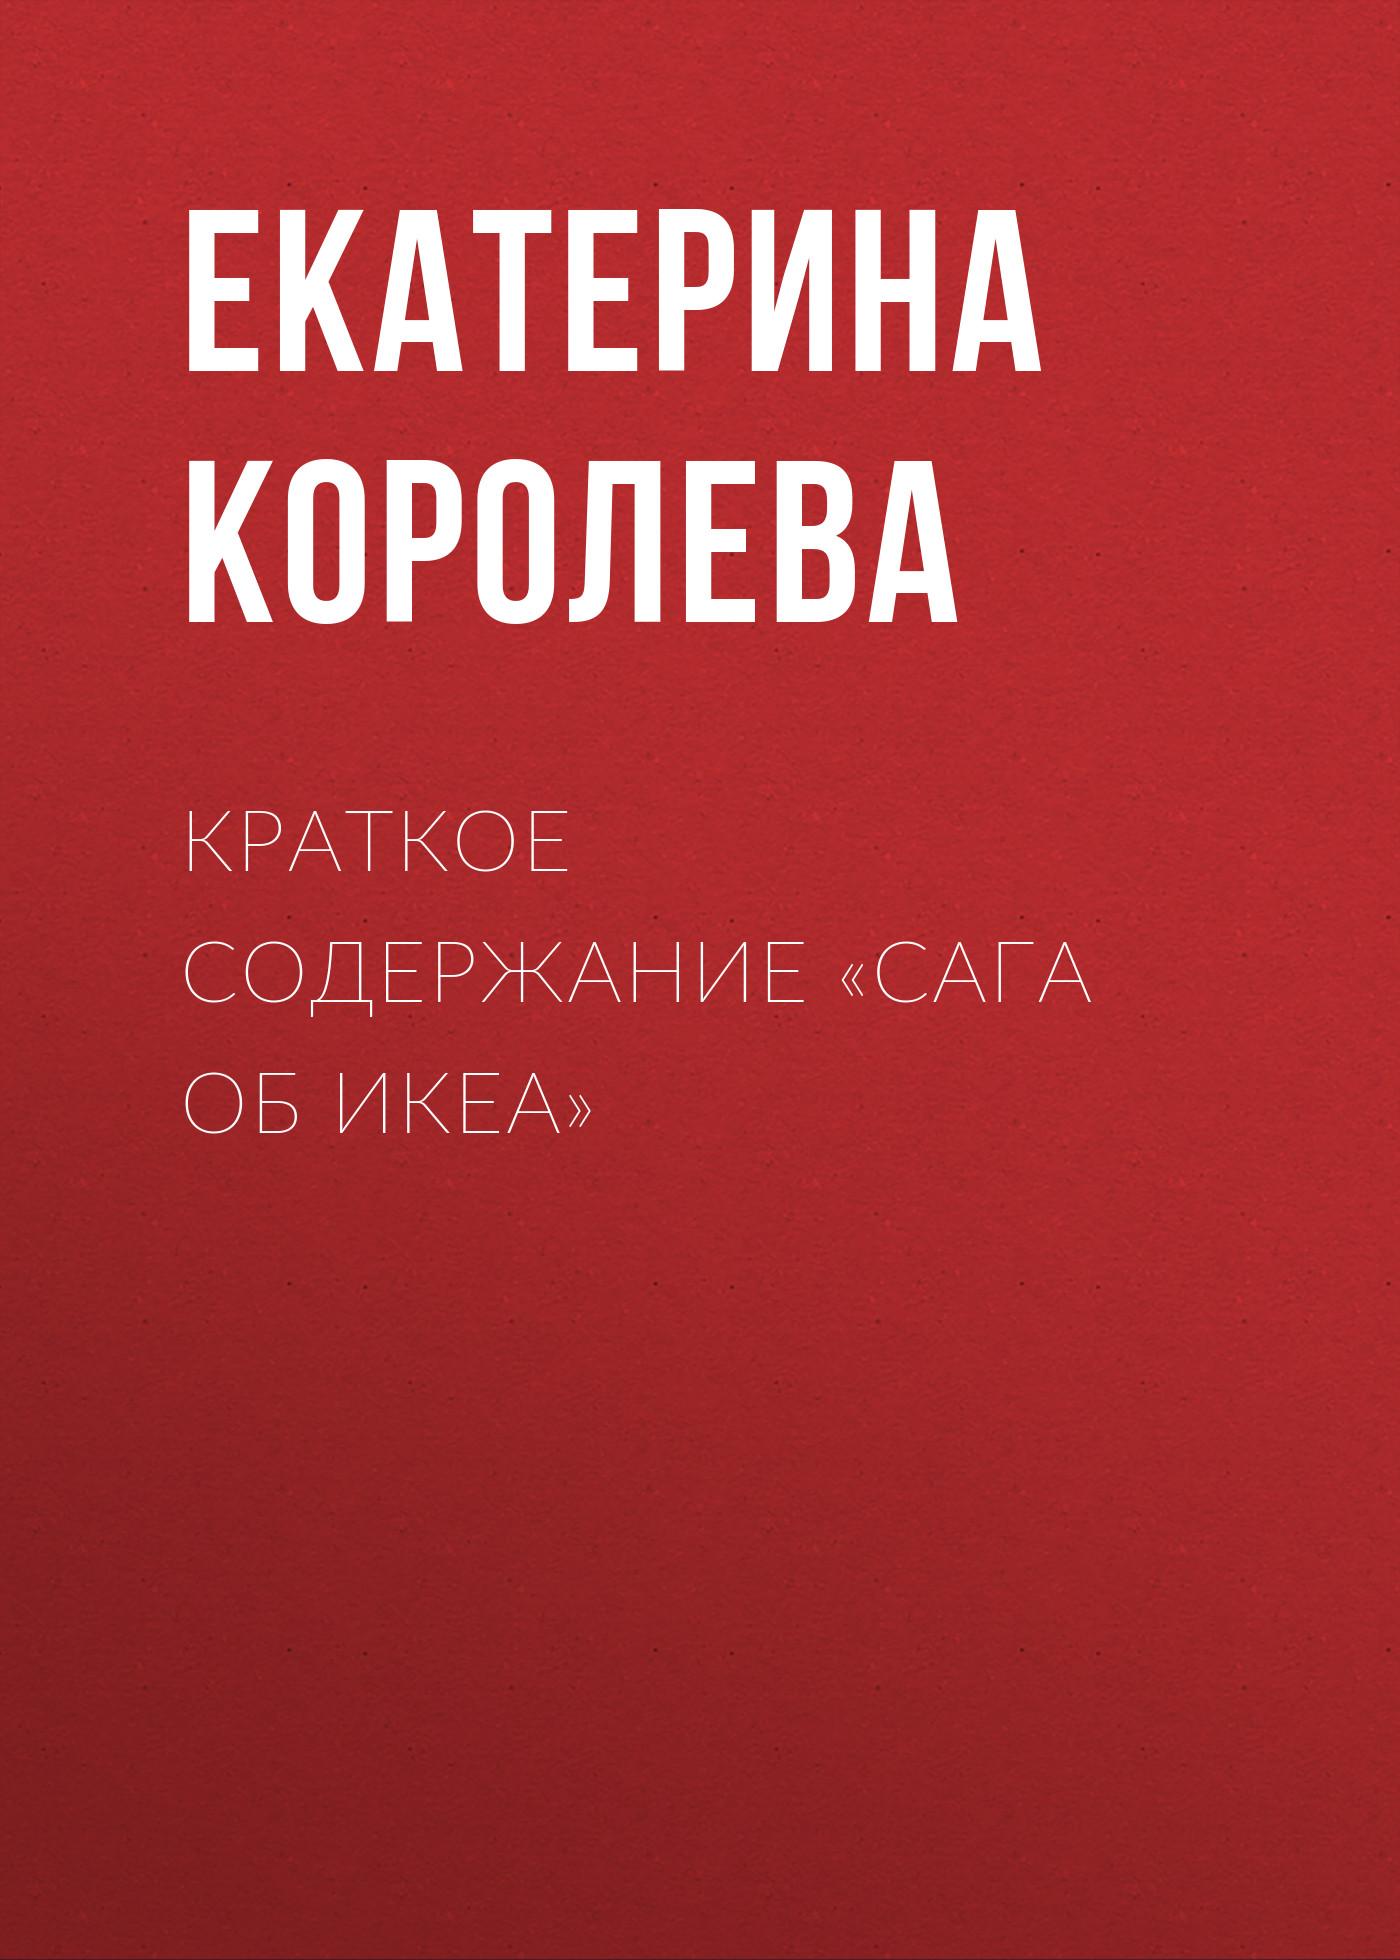 Екатерина Королева Краткое содержание «Сага об ИКЕА» электроварка ikea ikea 201 420 32 ikea